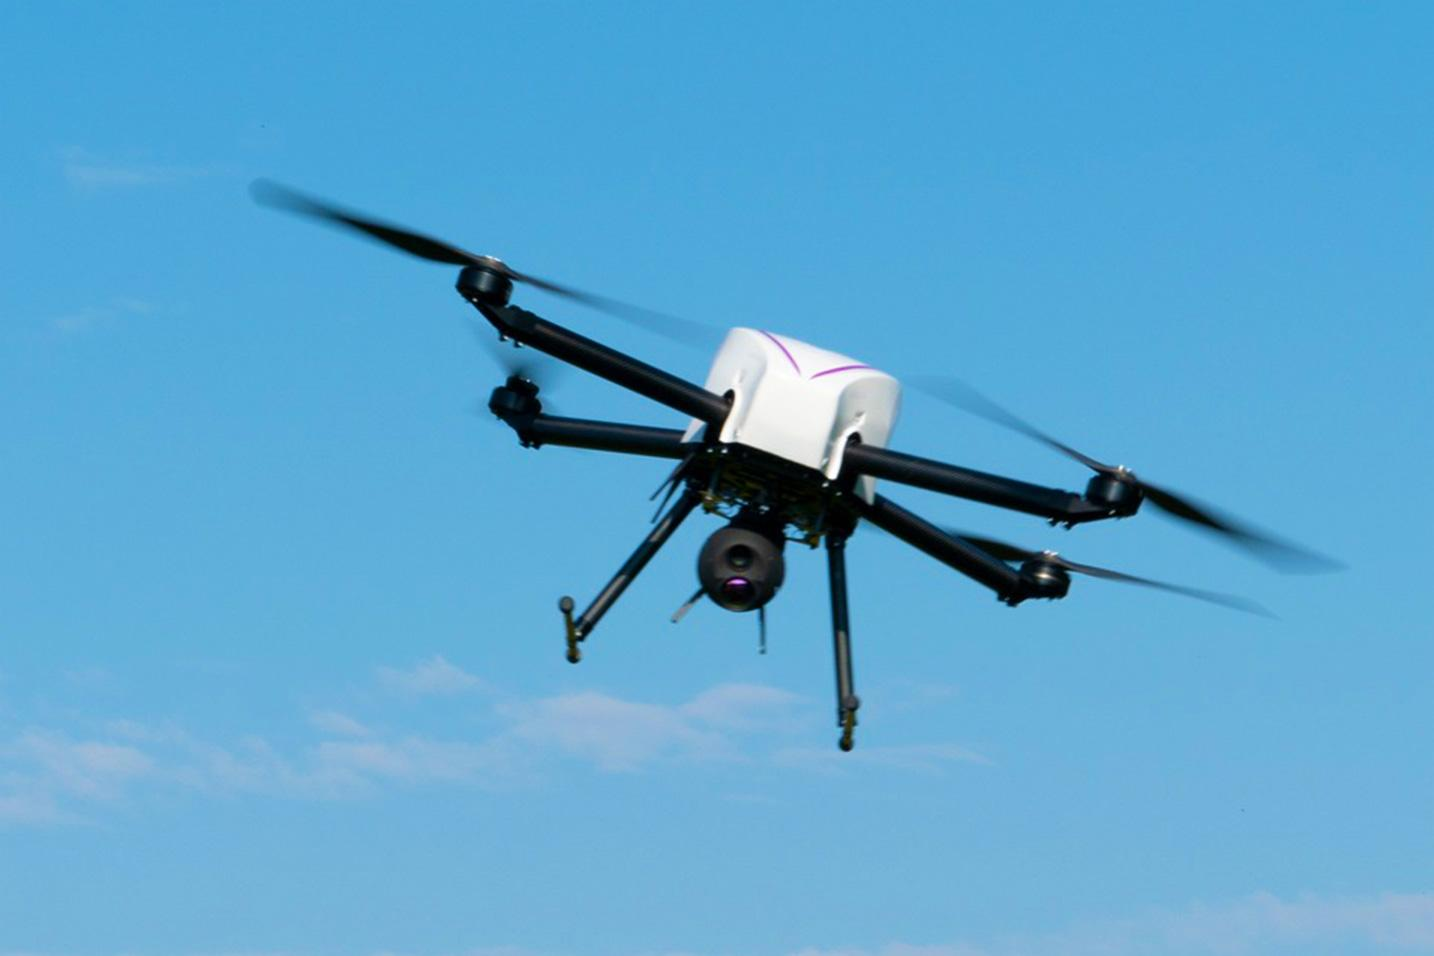 Quaternium's hybrid drone breaks the 10-hour mark